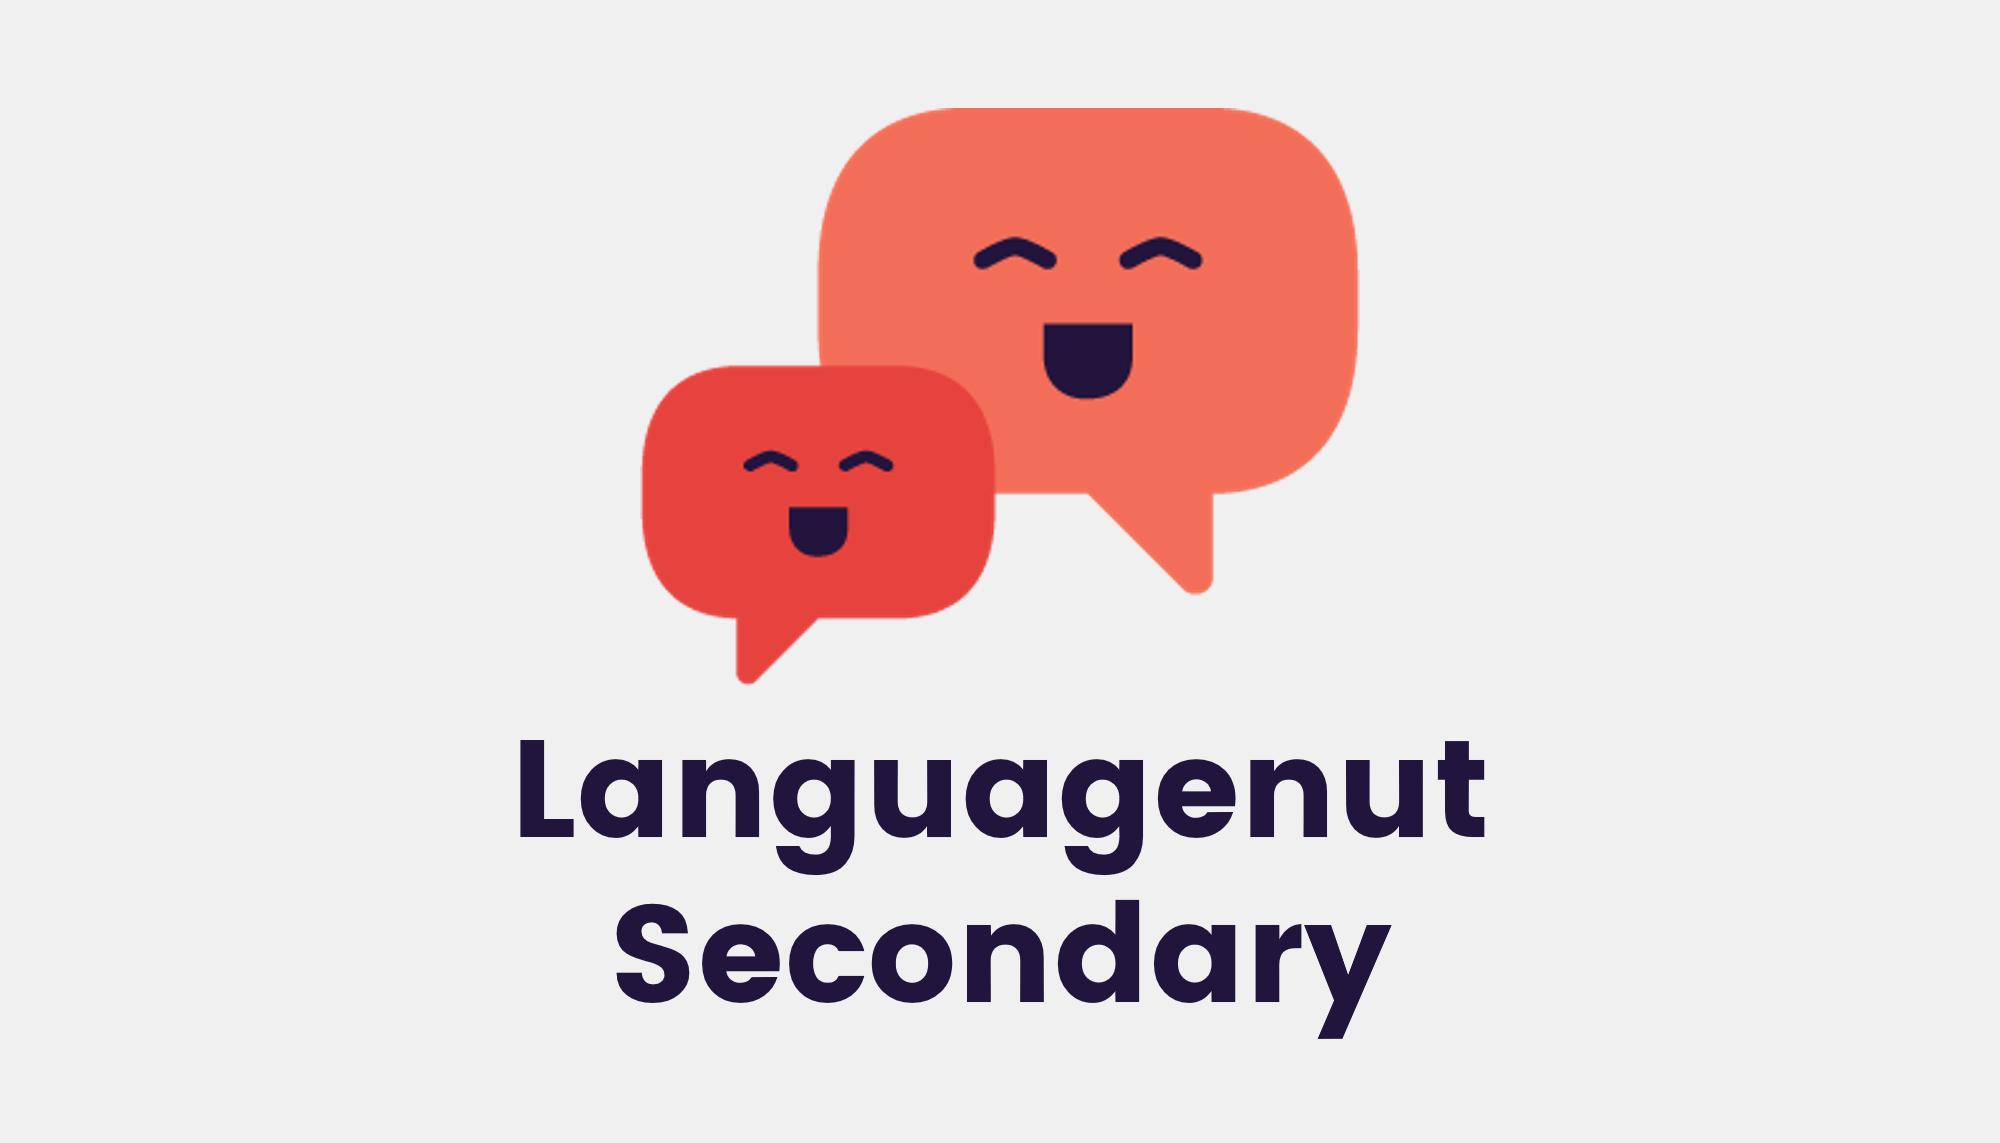 Languagenut Secondary   Languages for Secondary Schools